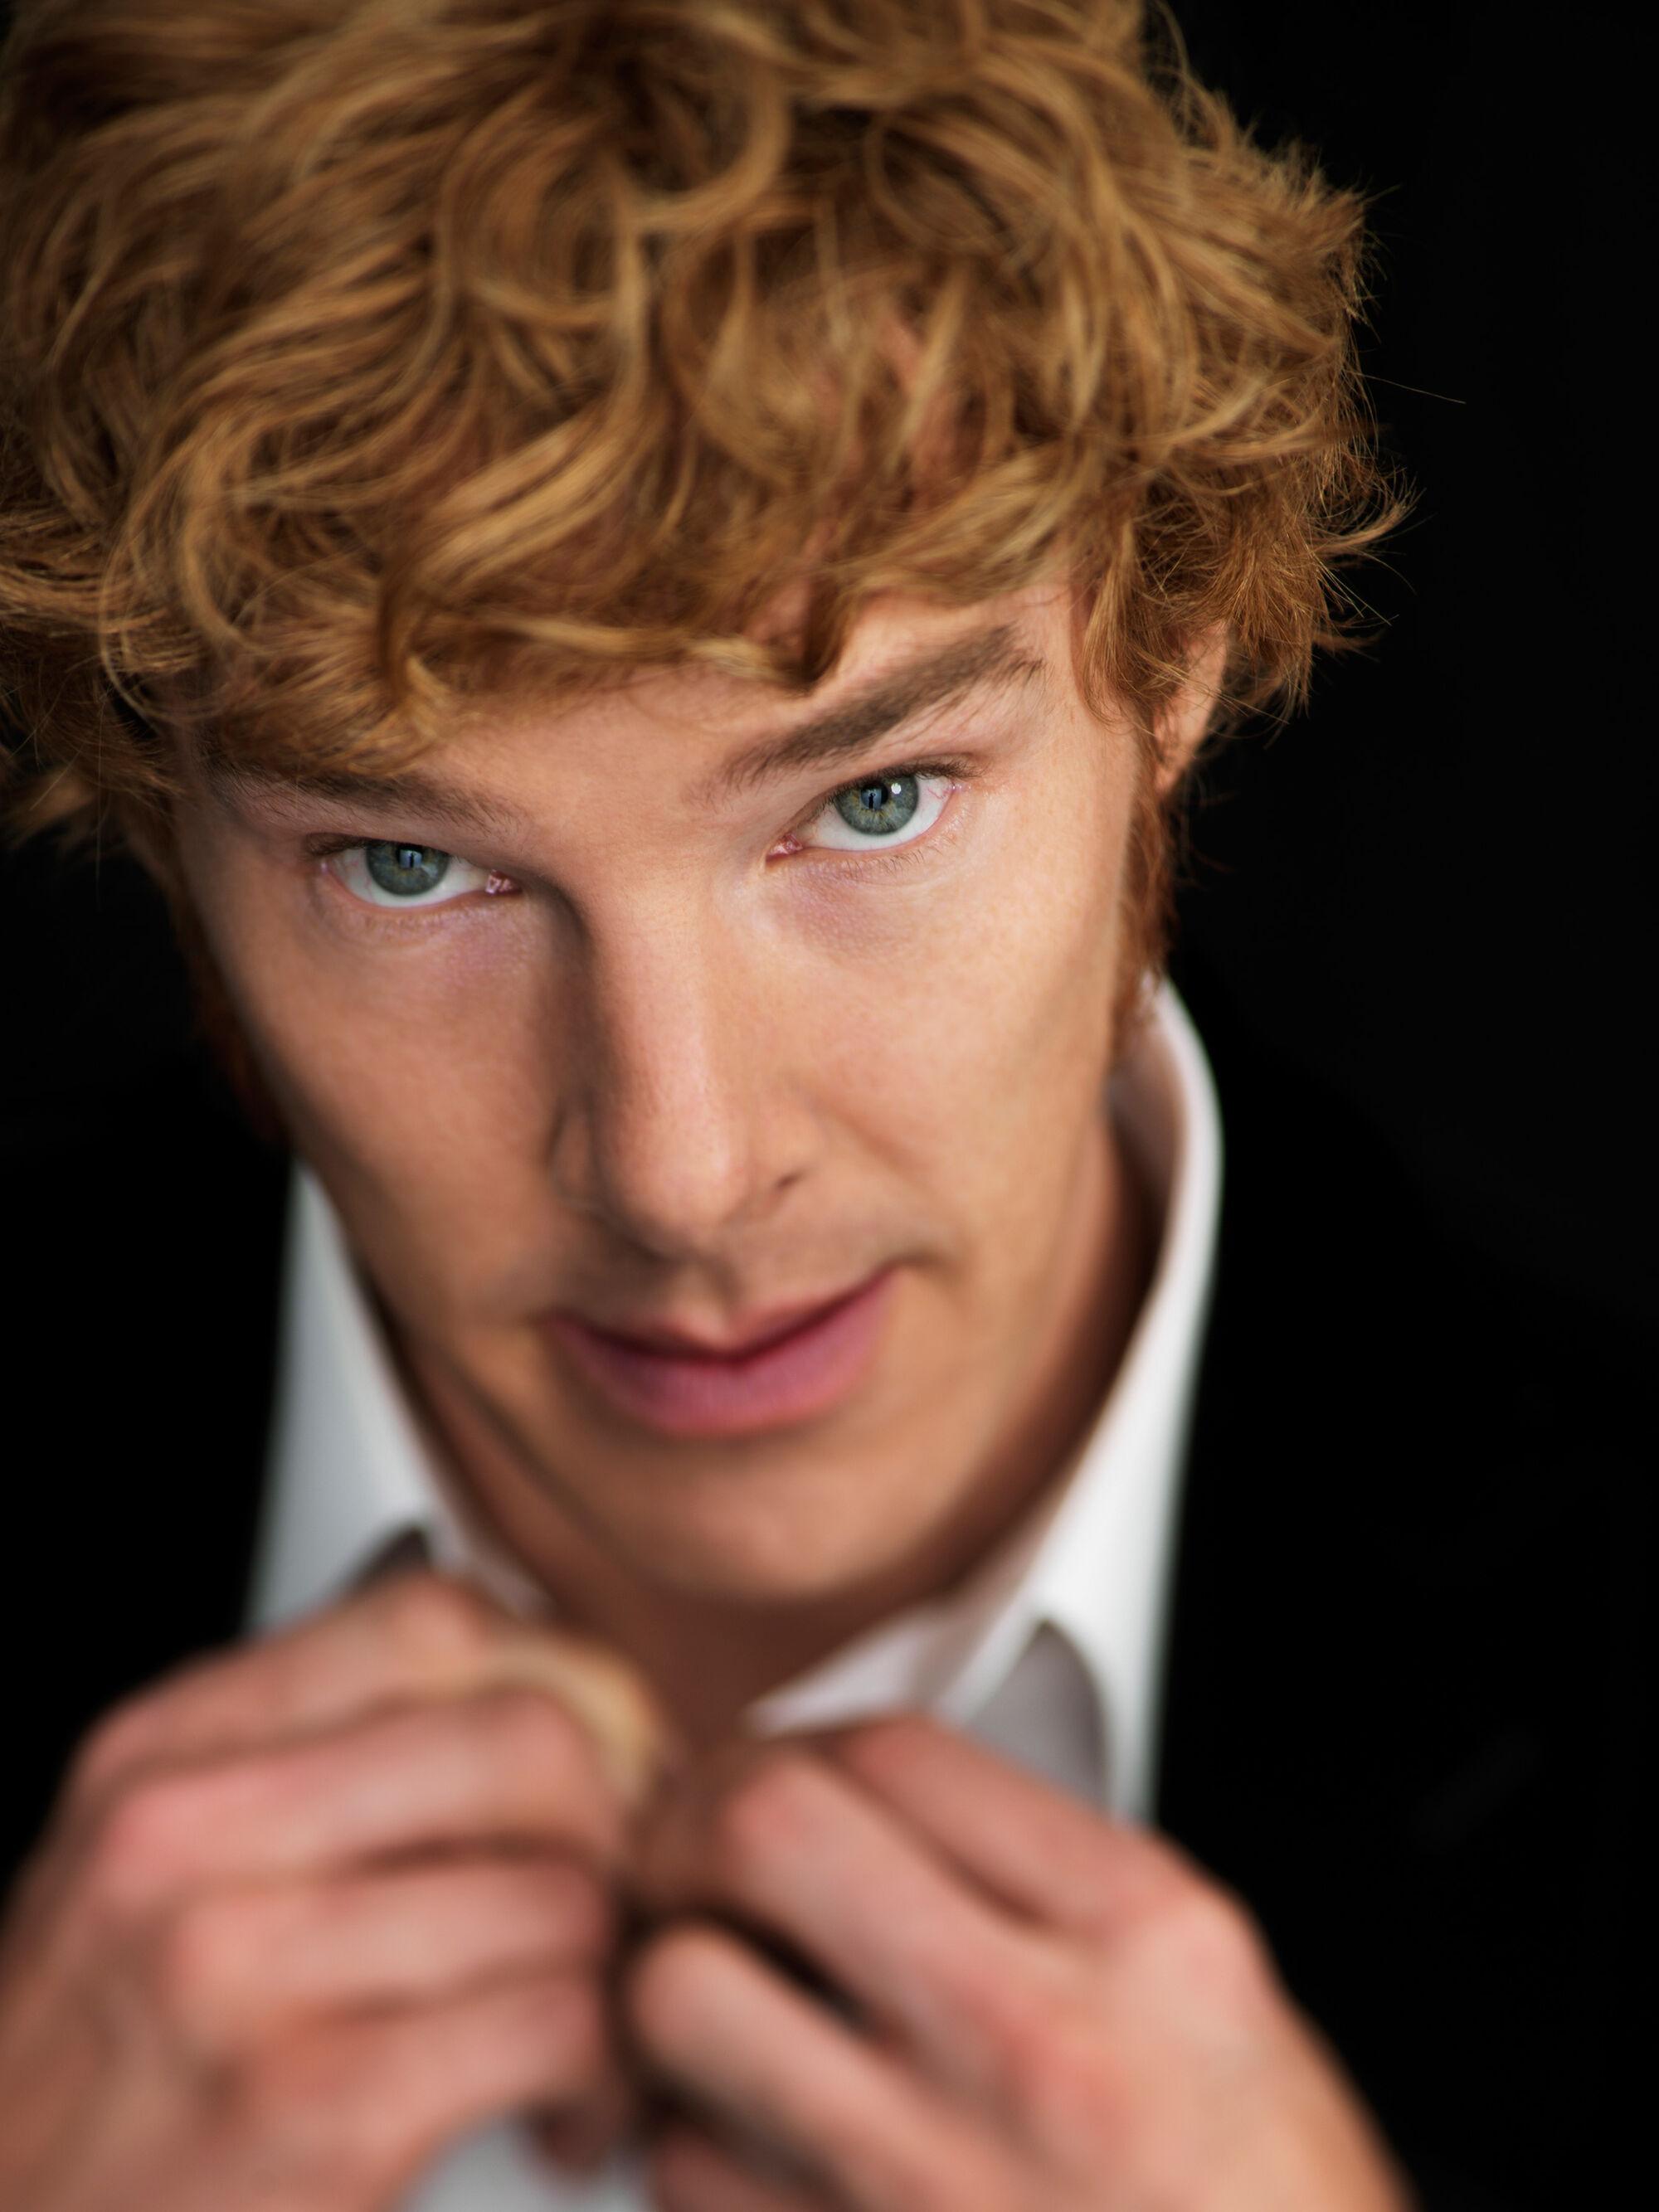 Benedict Cumberbatch | Baker Street Wiki | FANDOM powered by